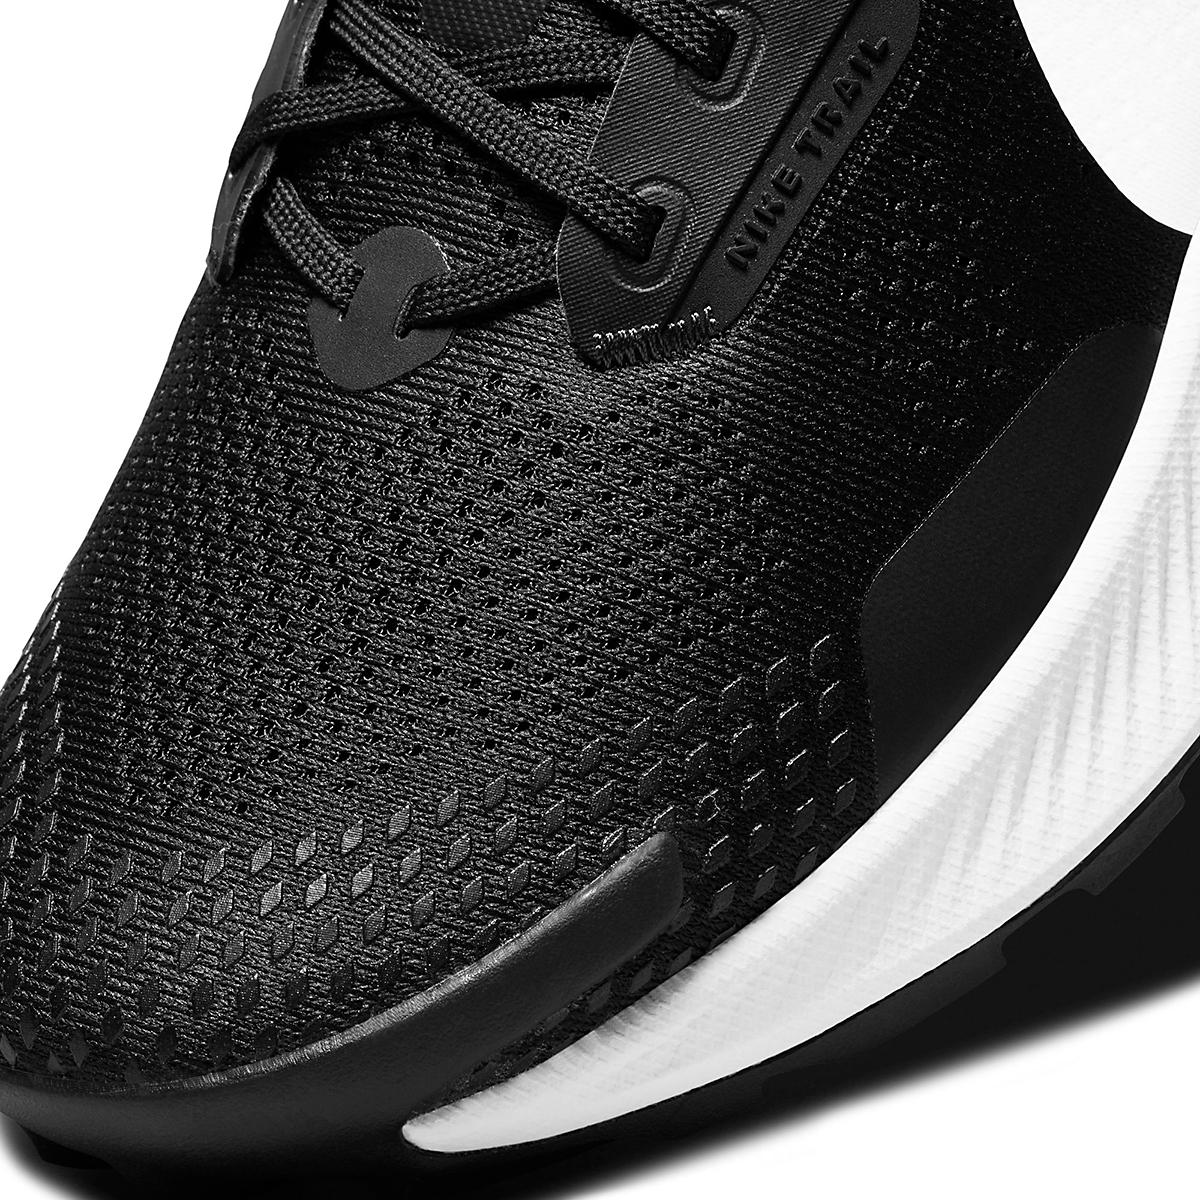 Men's Nike Pegasus Trail 3 Trail Running Shoe  - Color: Black/Pure Platinum/Dark Smoke Grey  - Size: 6 - Width: Regular, Black/Pure Platinum/Dark Smoke Grey, large, image 5